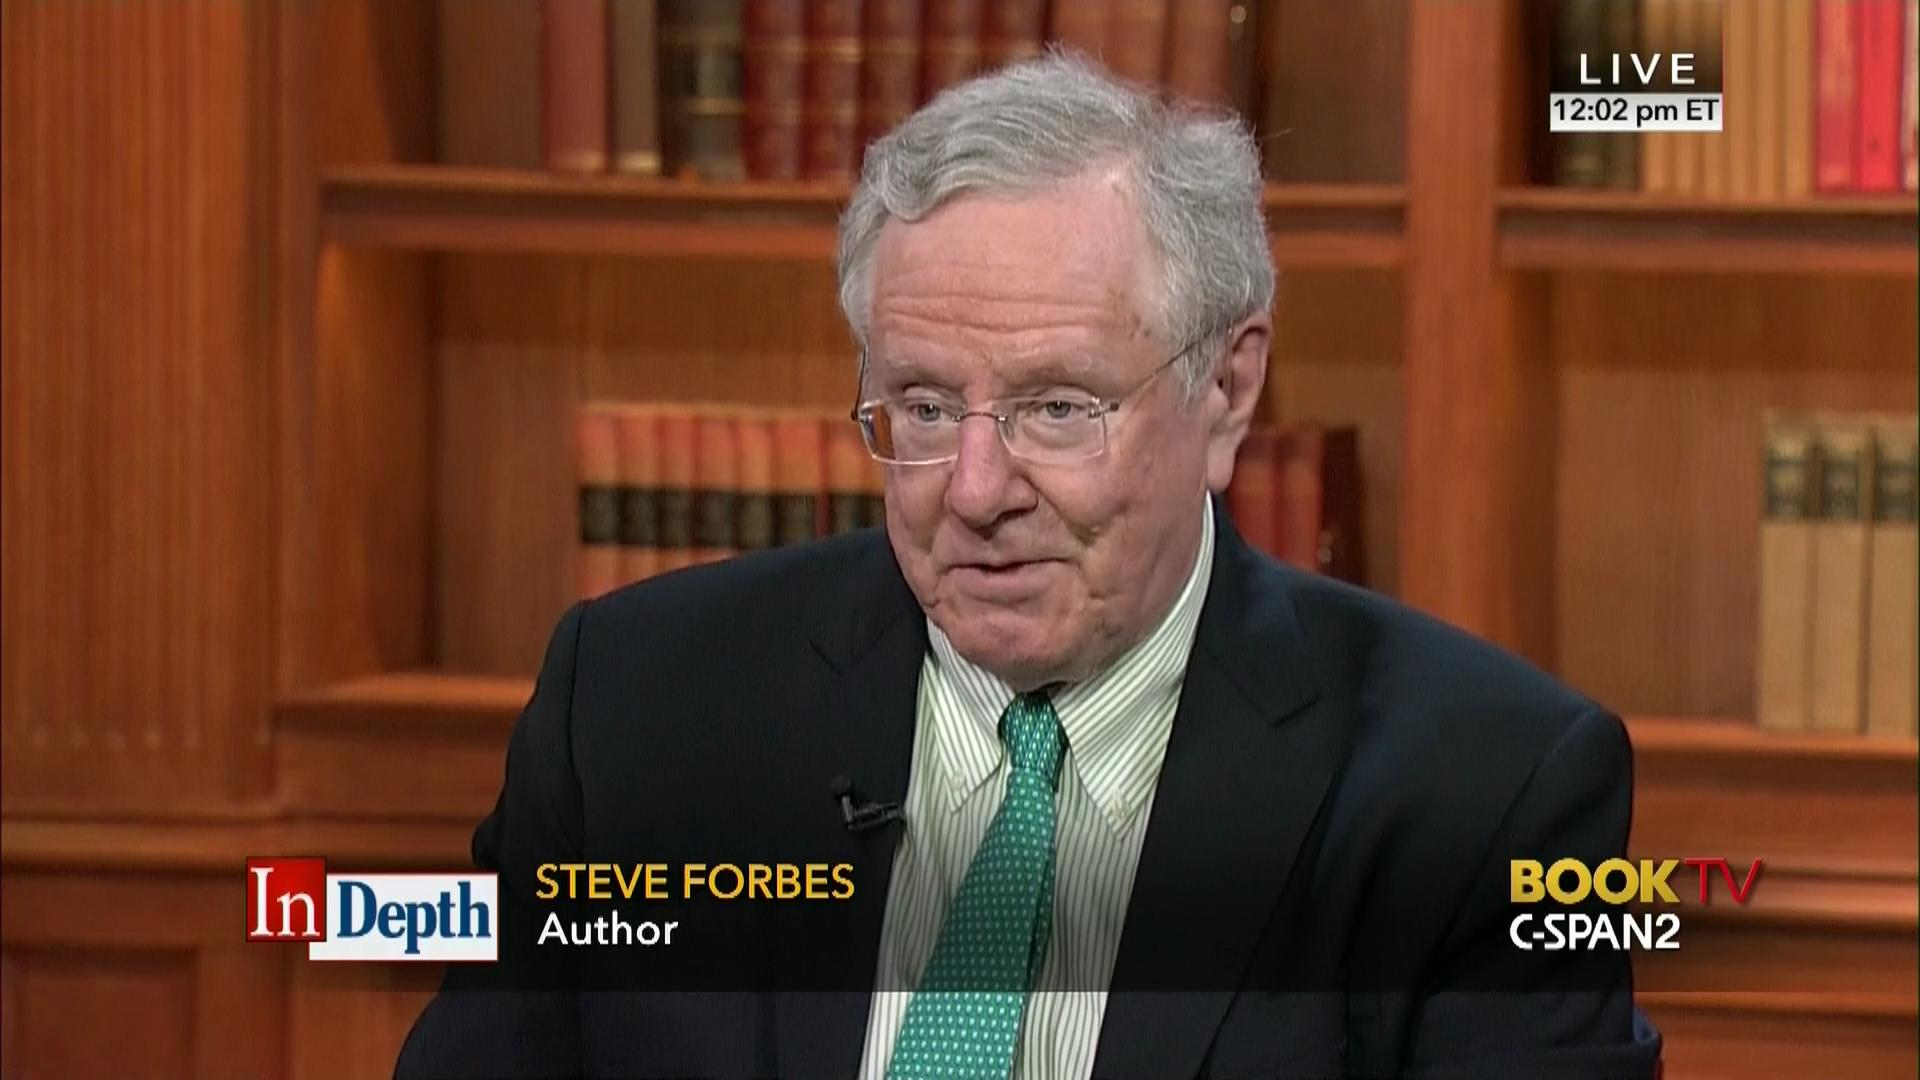 Steve Forbes Wife